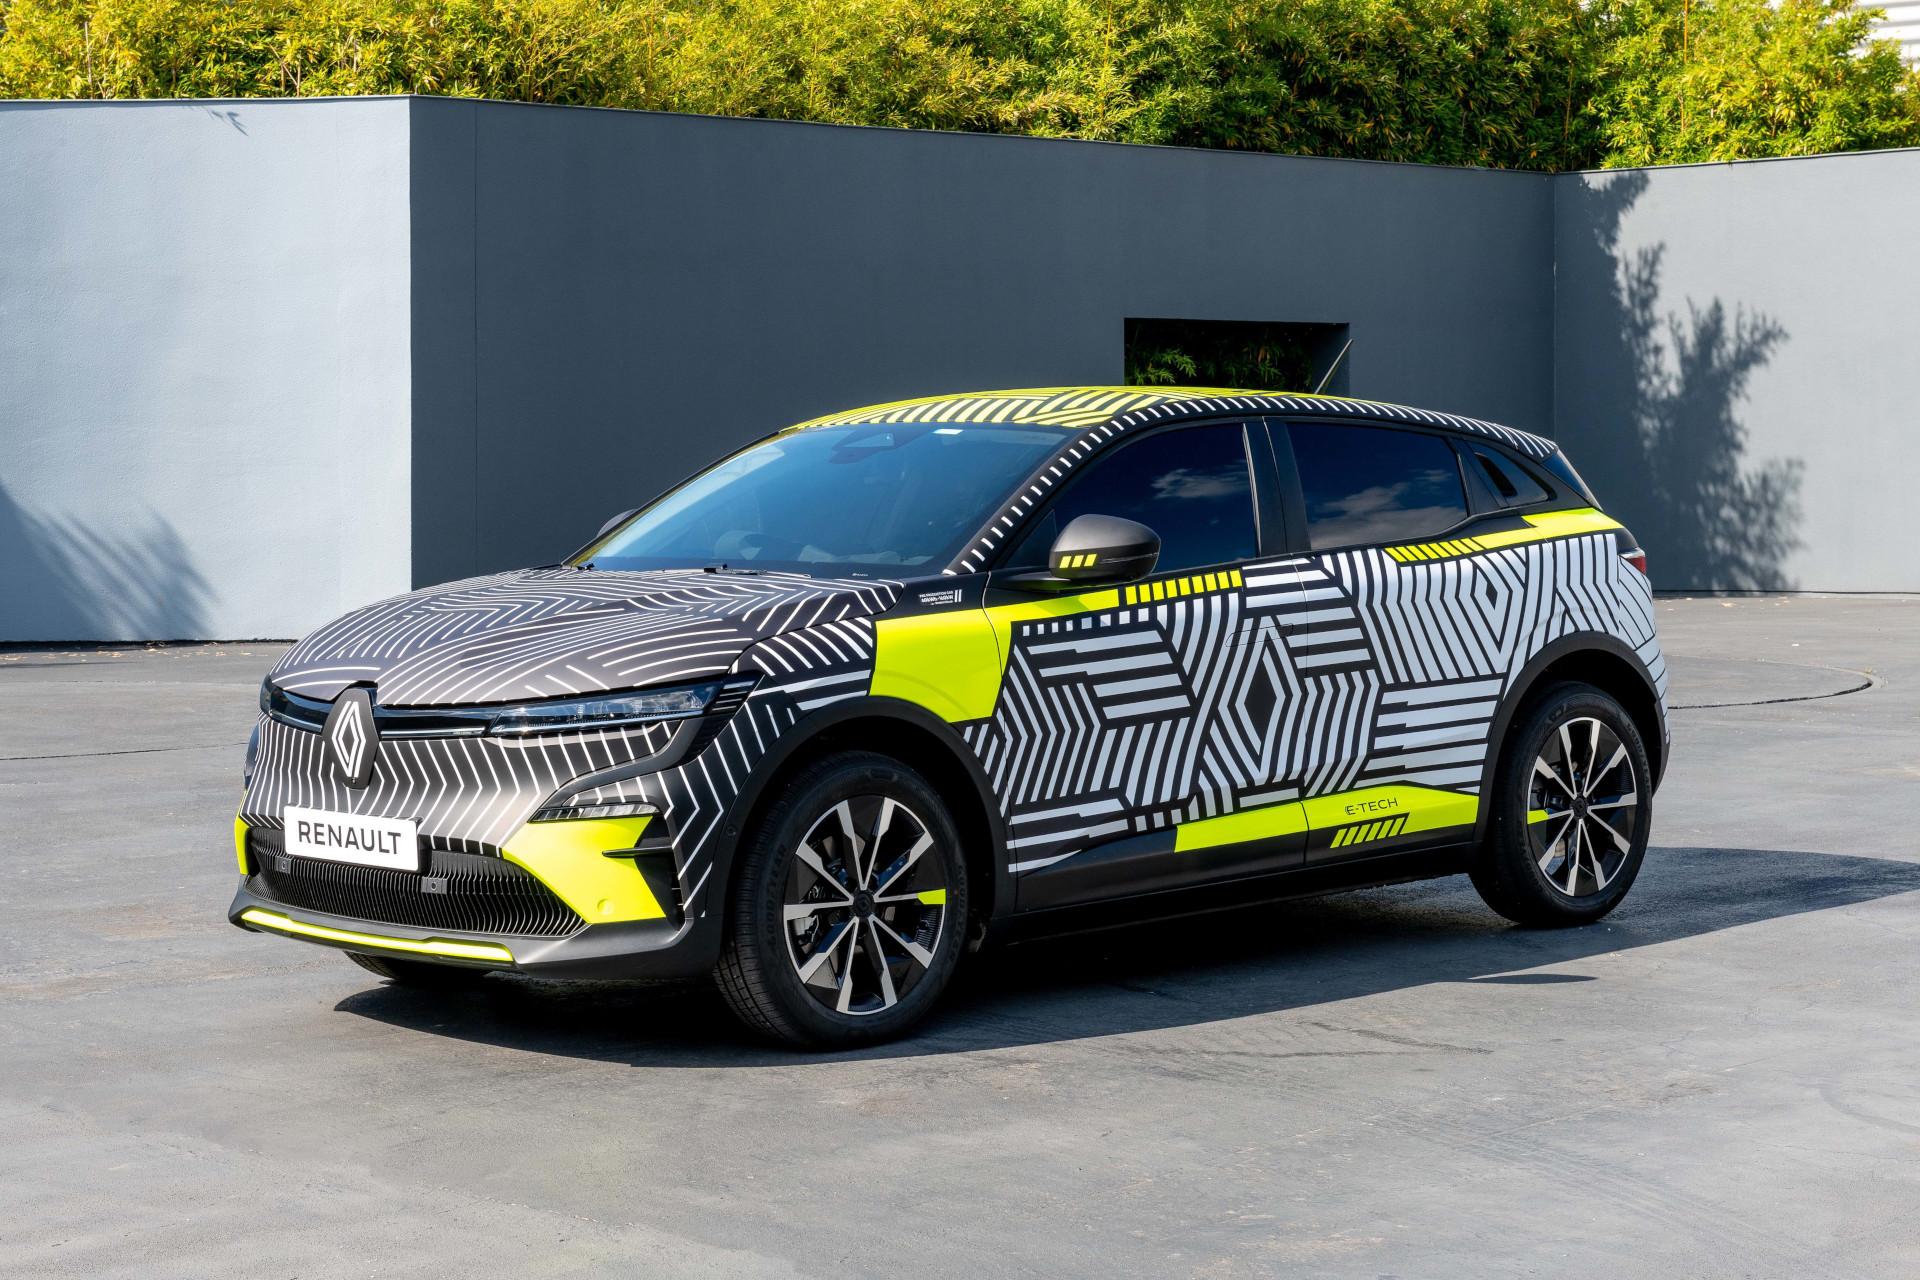 2021 - New Renault MEGANE E-TECH Electric pre-production